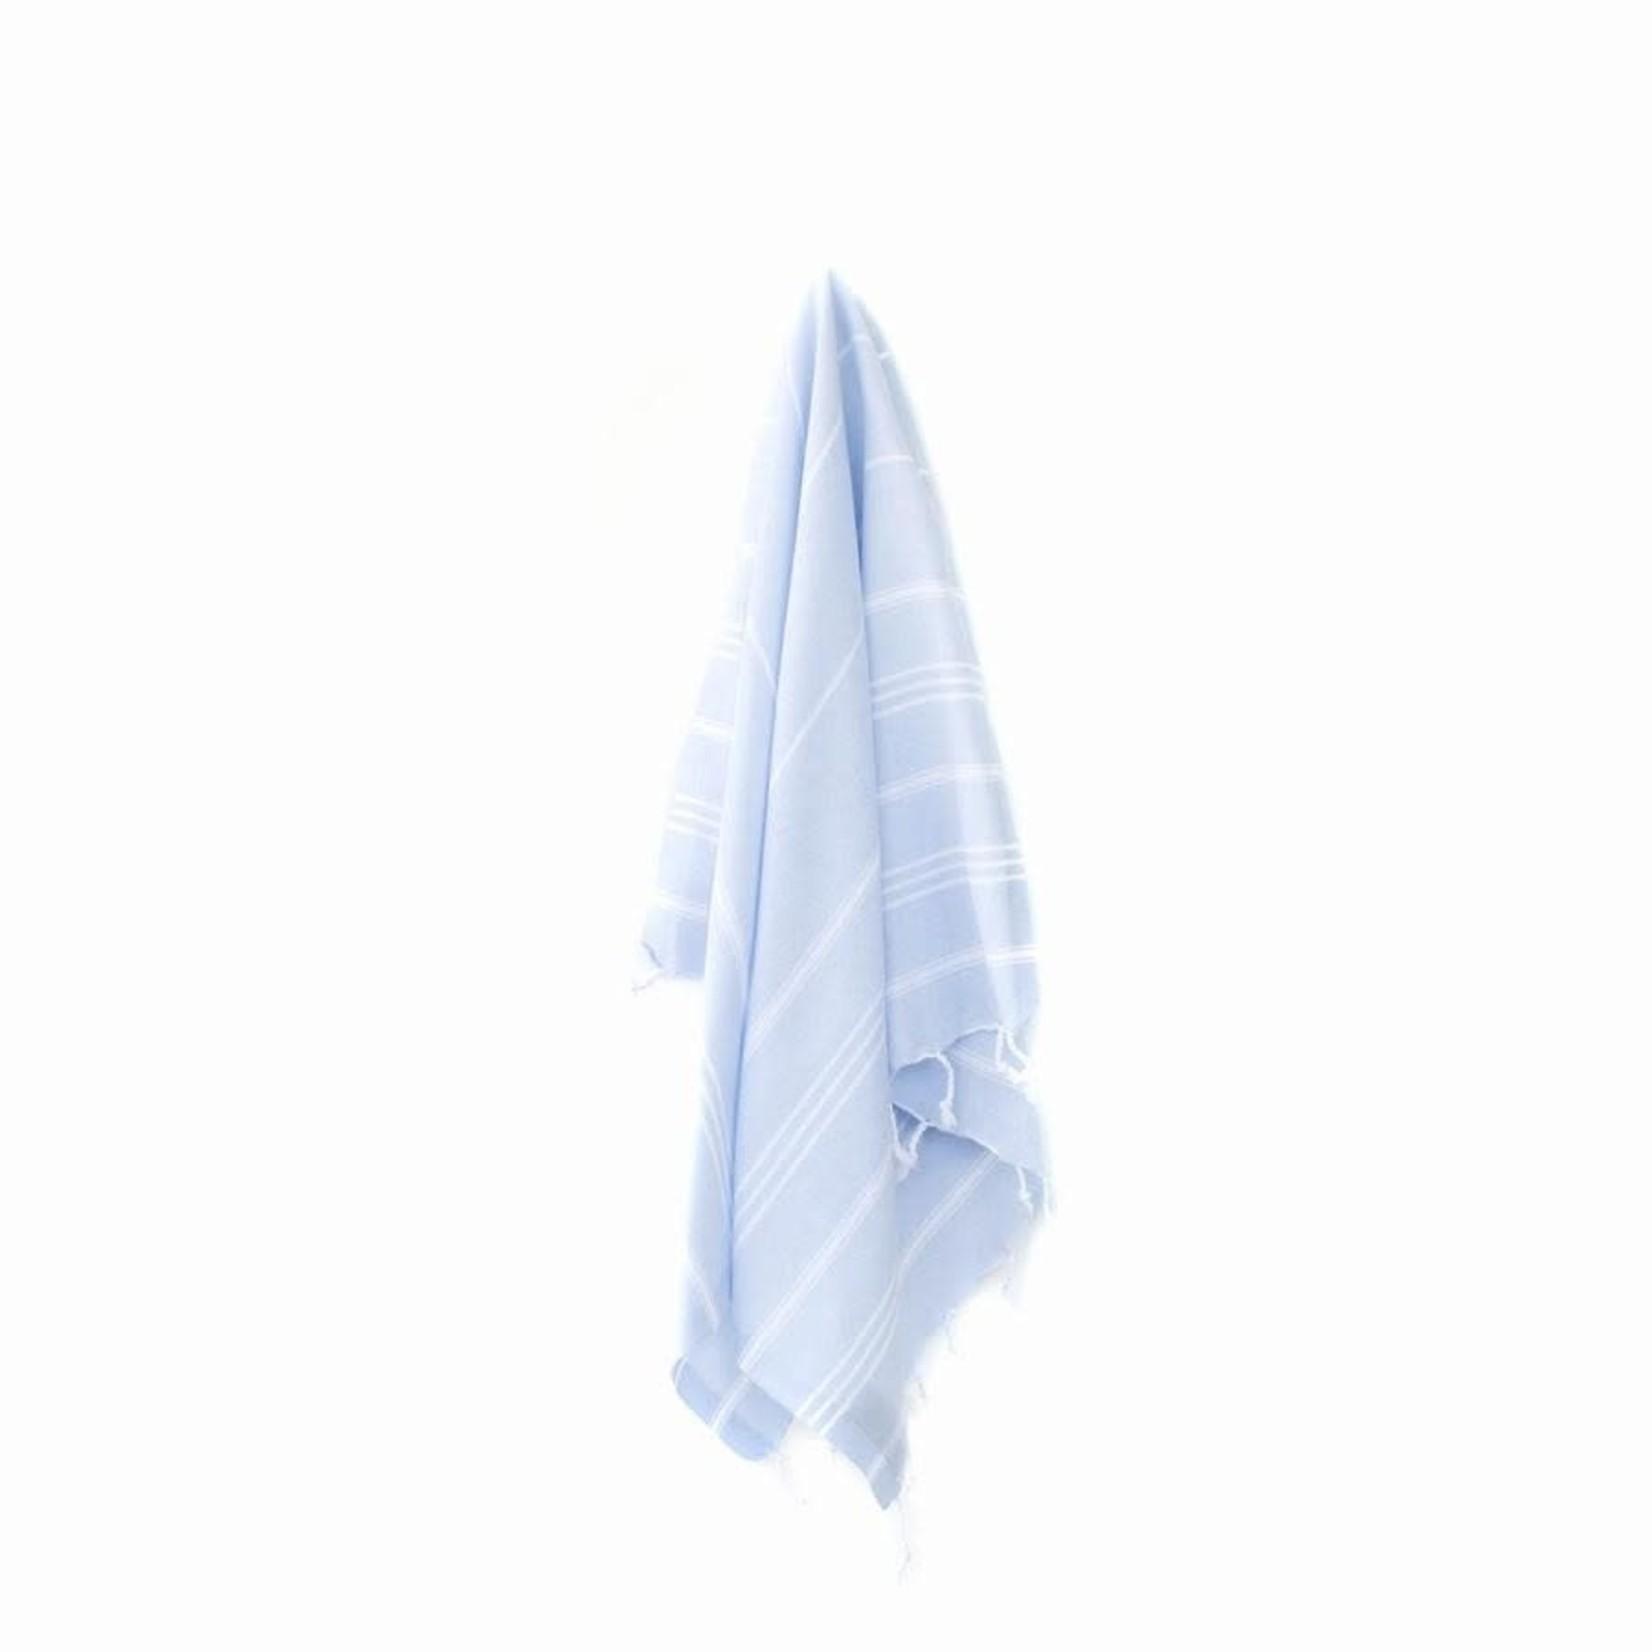 STRAY + WANDER MARIN SMALL TOWEL - POWDER BLUE